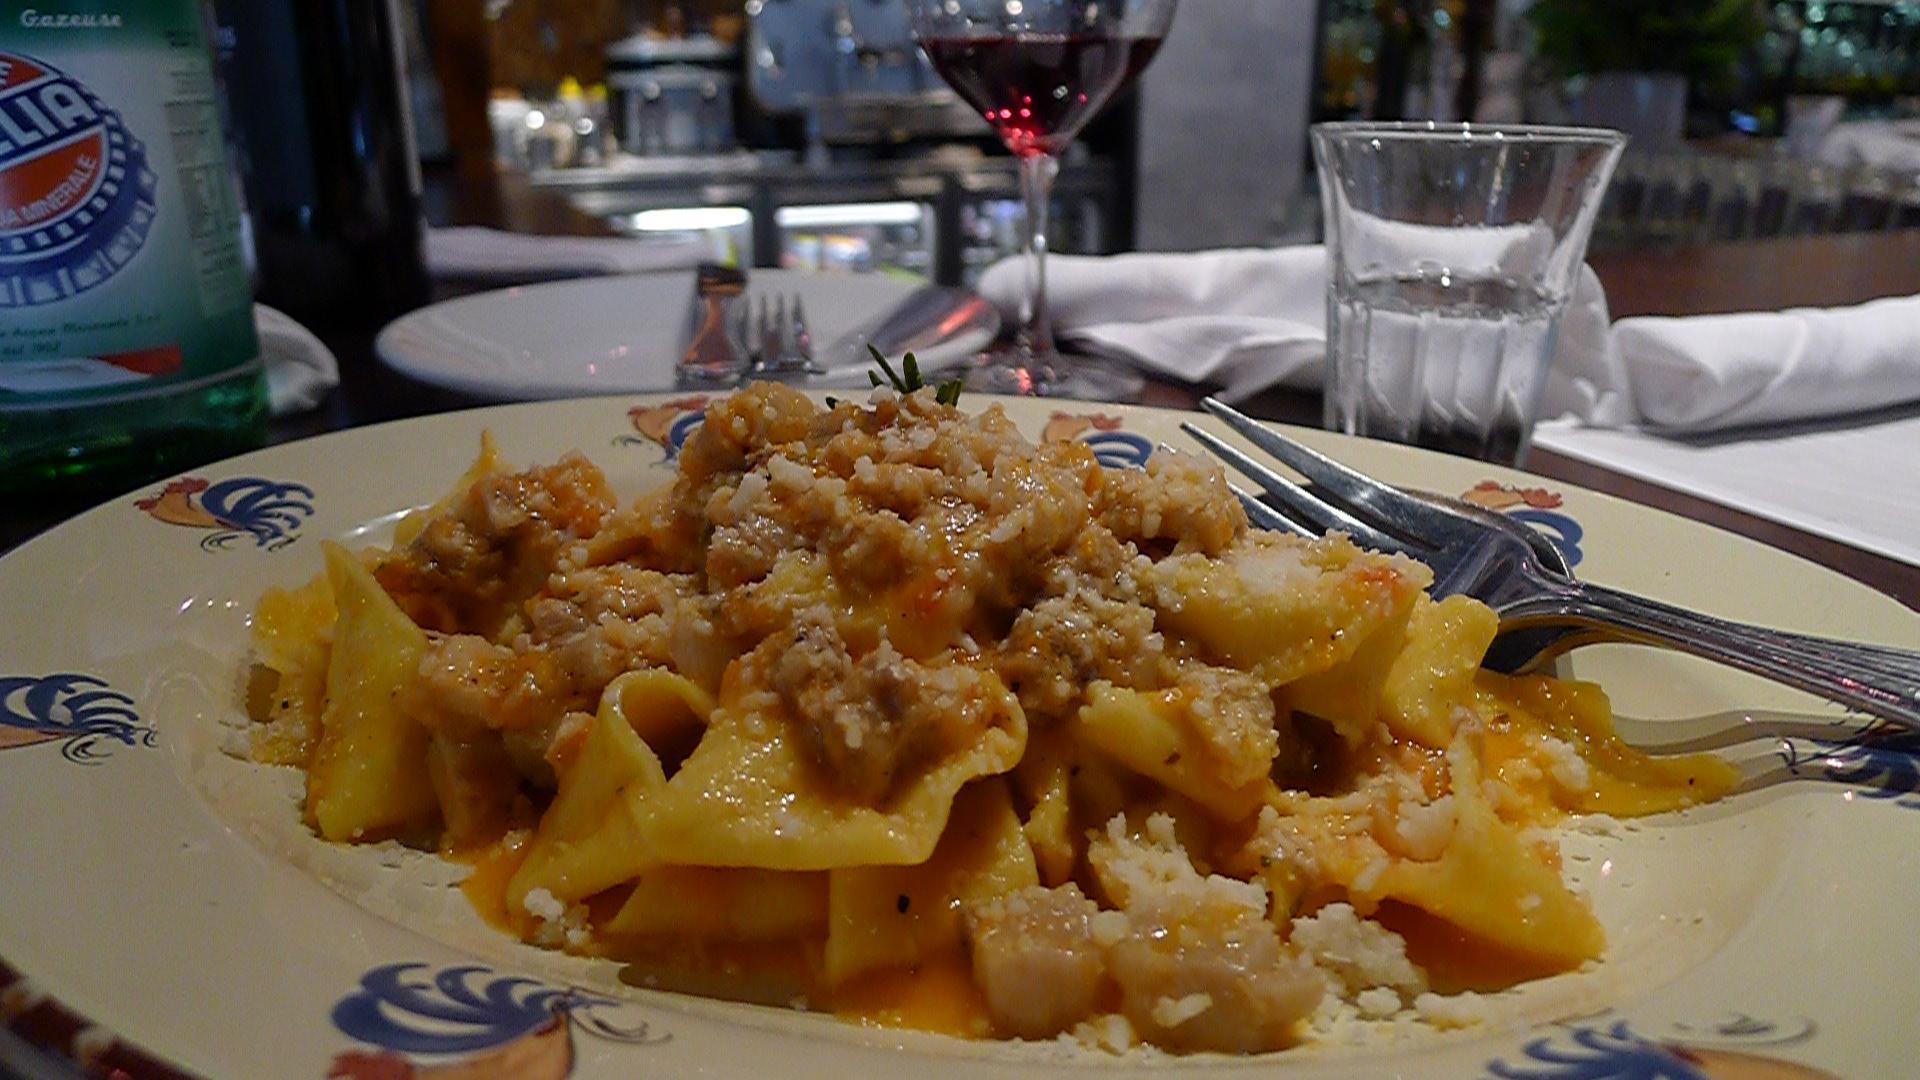 Papardelle Con Porchetta - Handmade pasta w/ slow roasted pork shoulder & Pecorino Romano